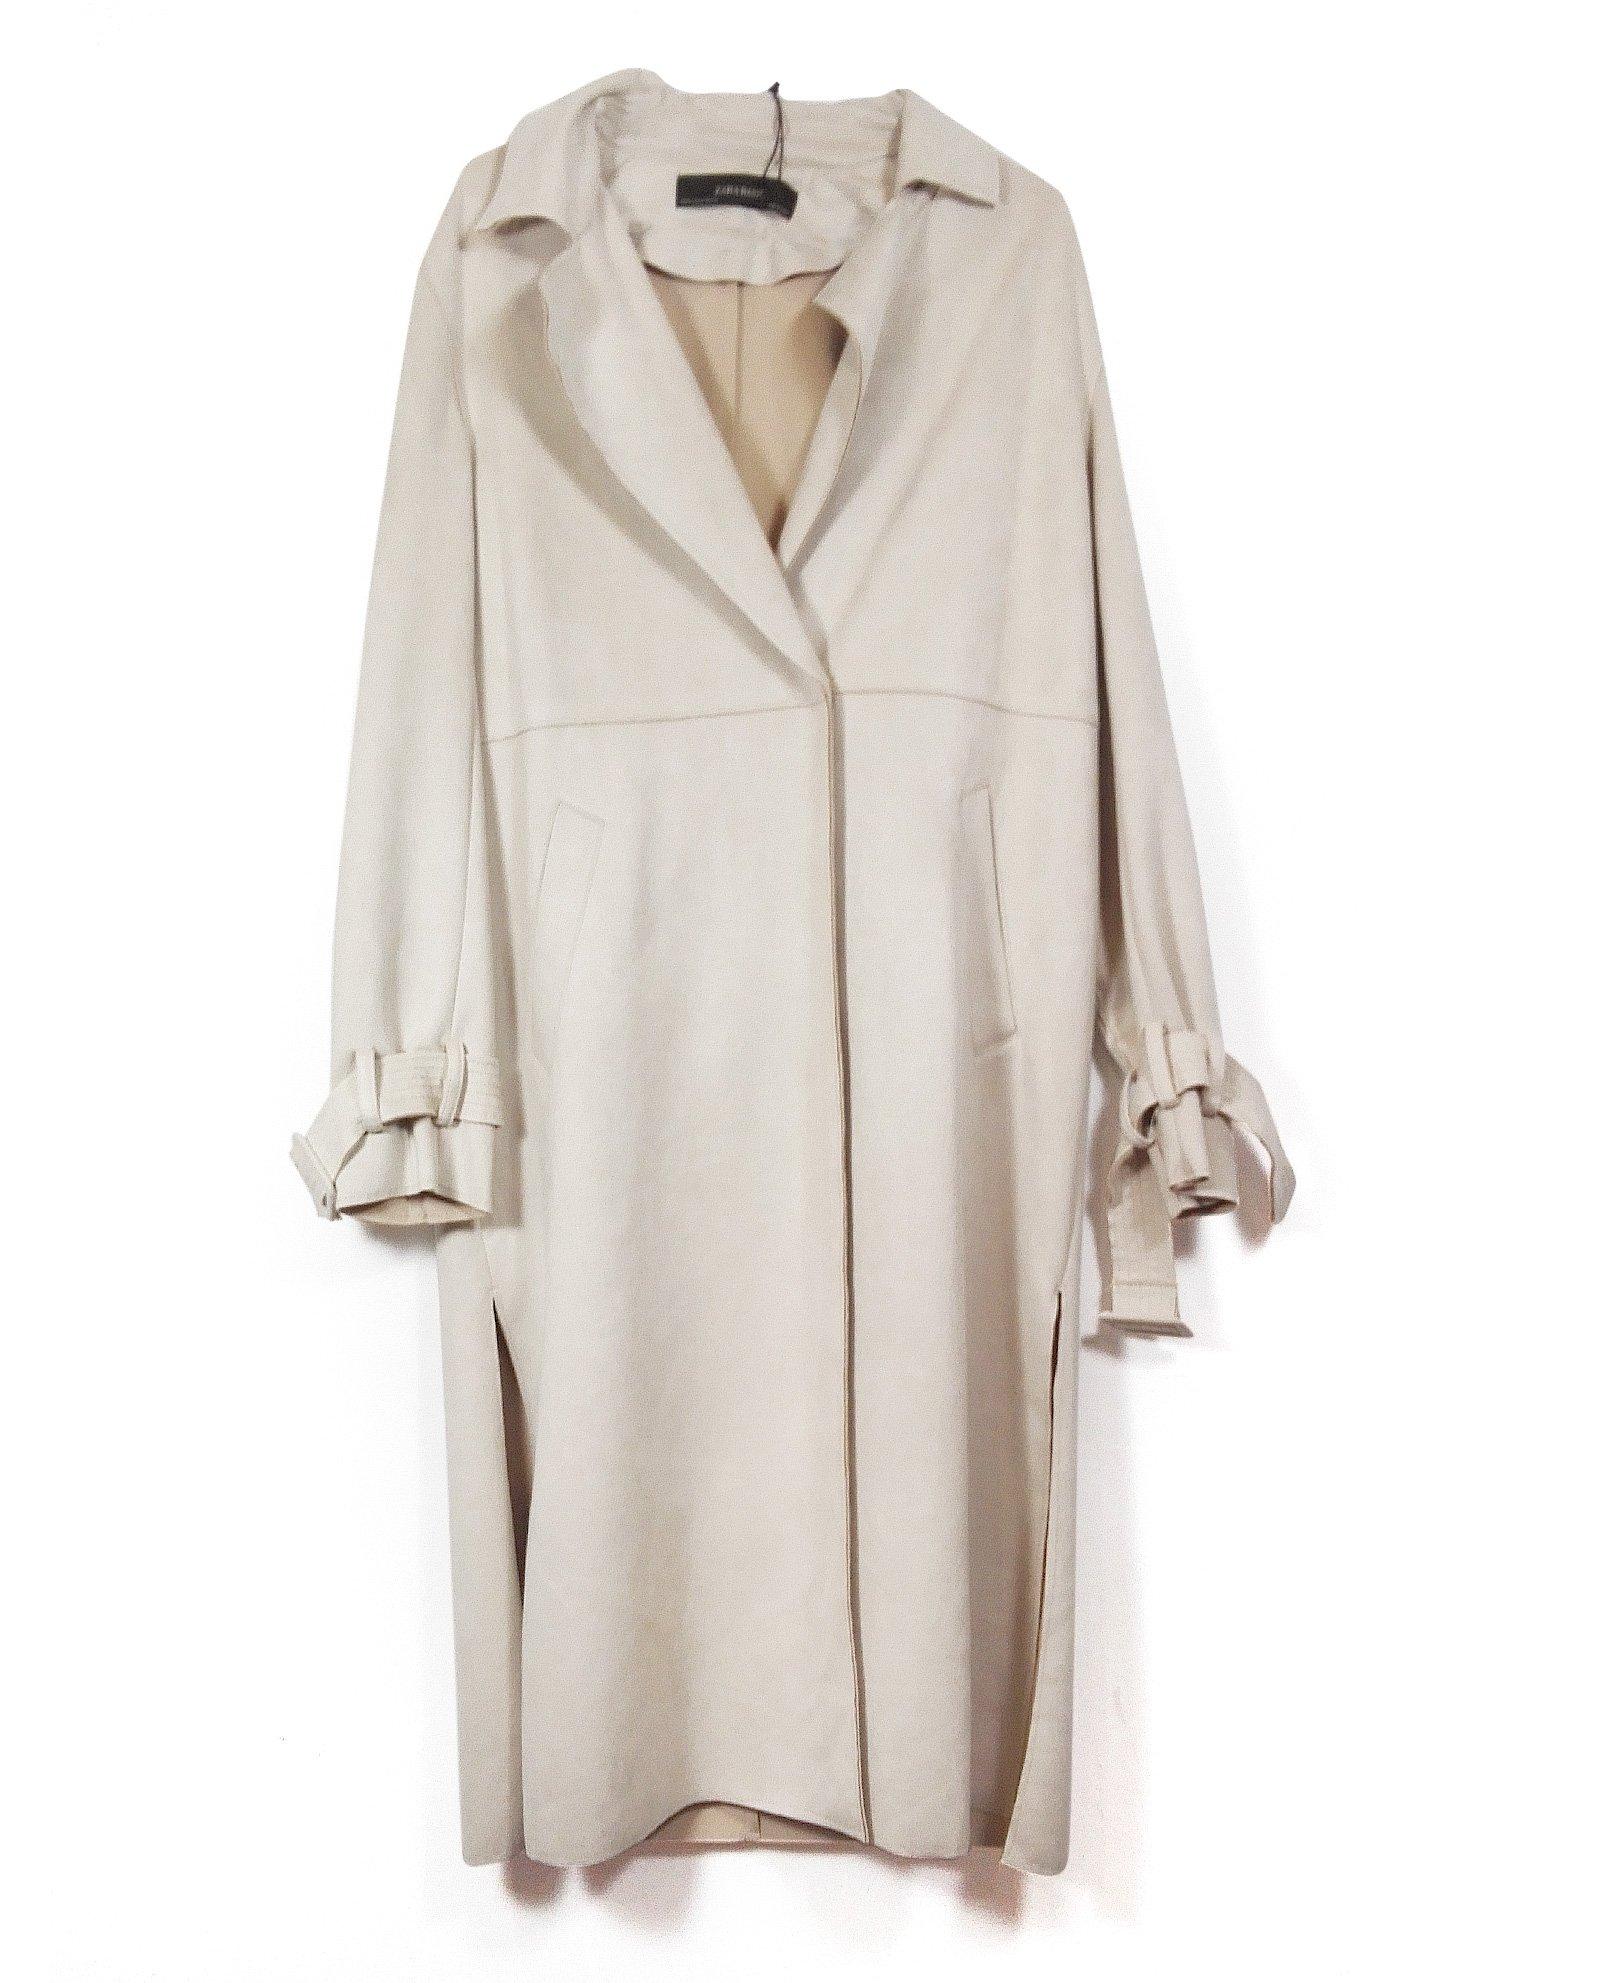 Zara Women Suede Effect Trench Coat 6318/025 (Small)